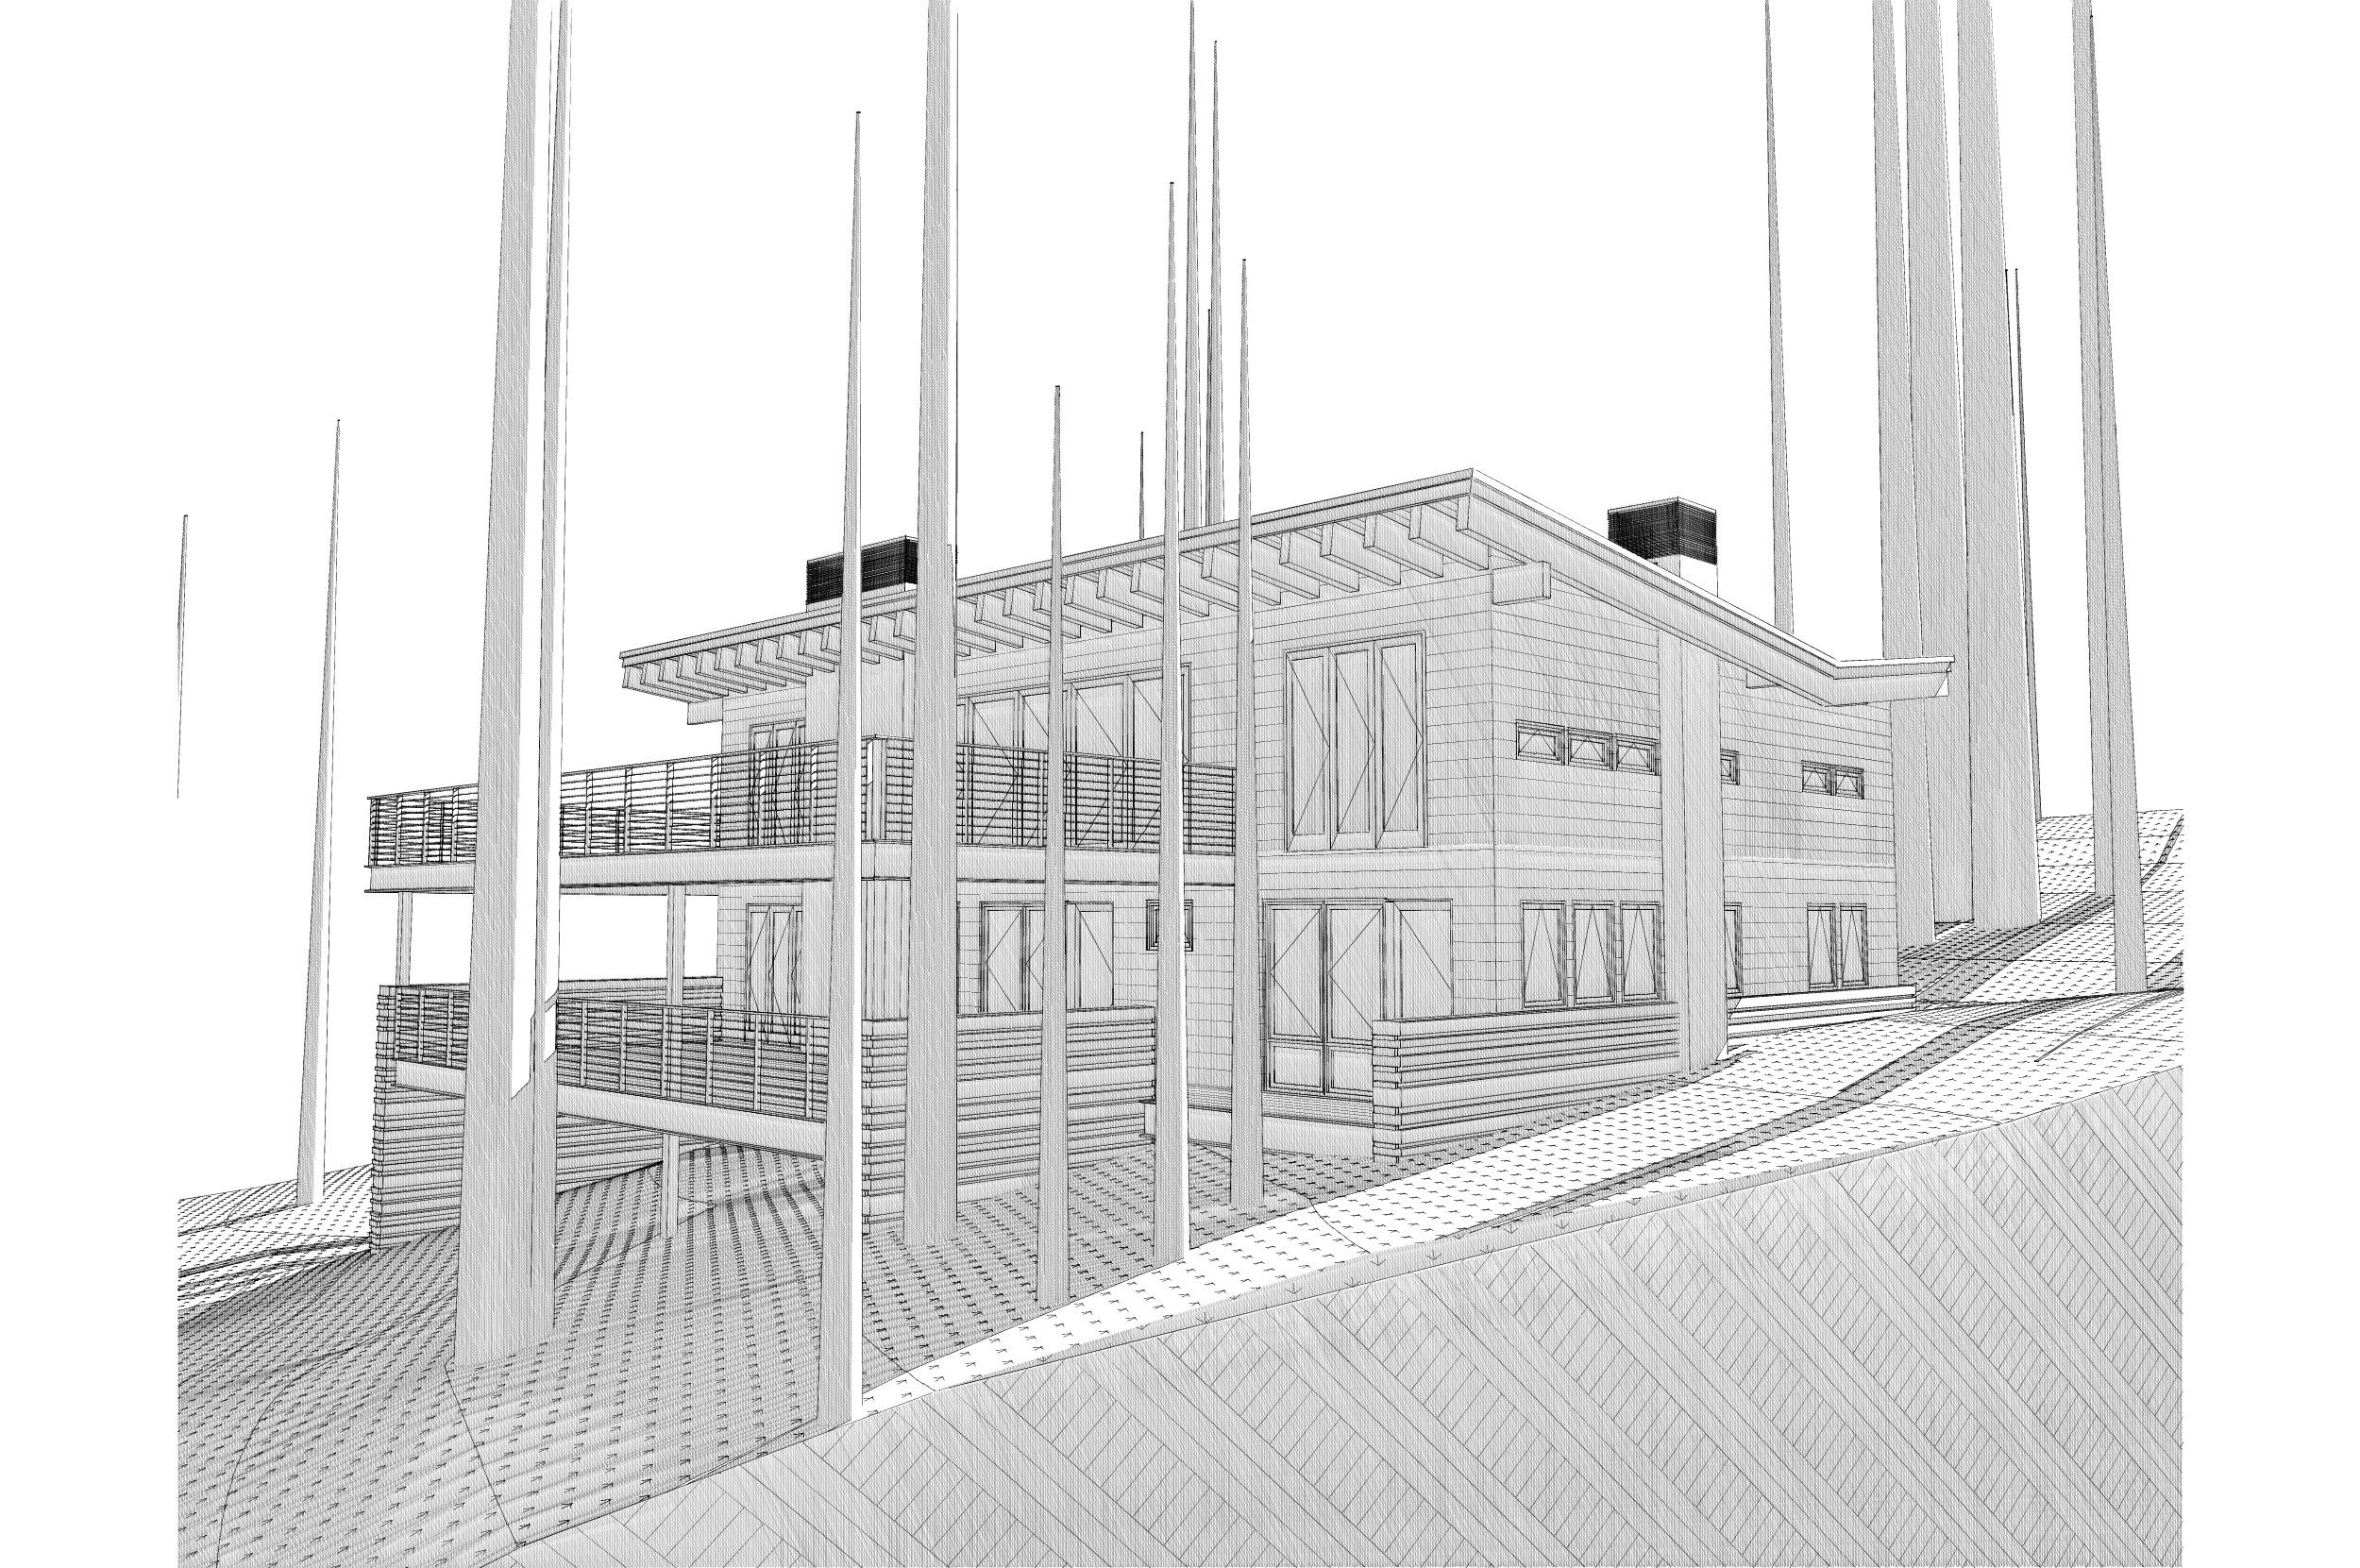 ARCHITECTURE MODERN MOUNTAIN DESIGN FV 02.jpg